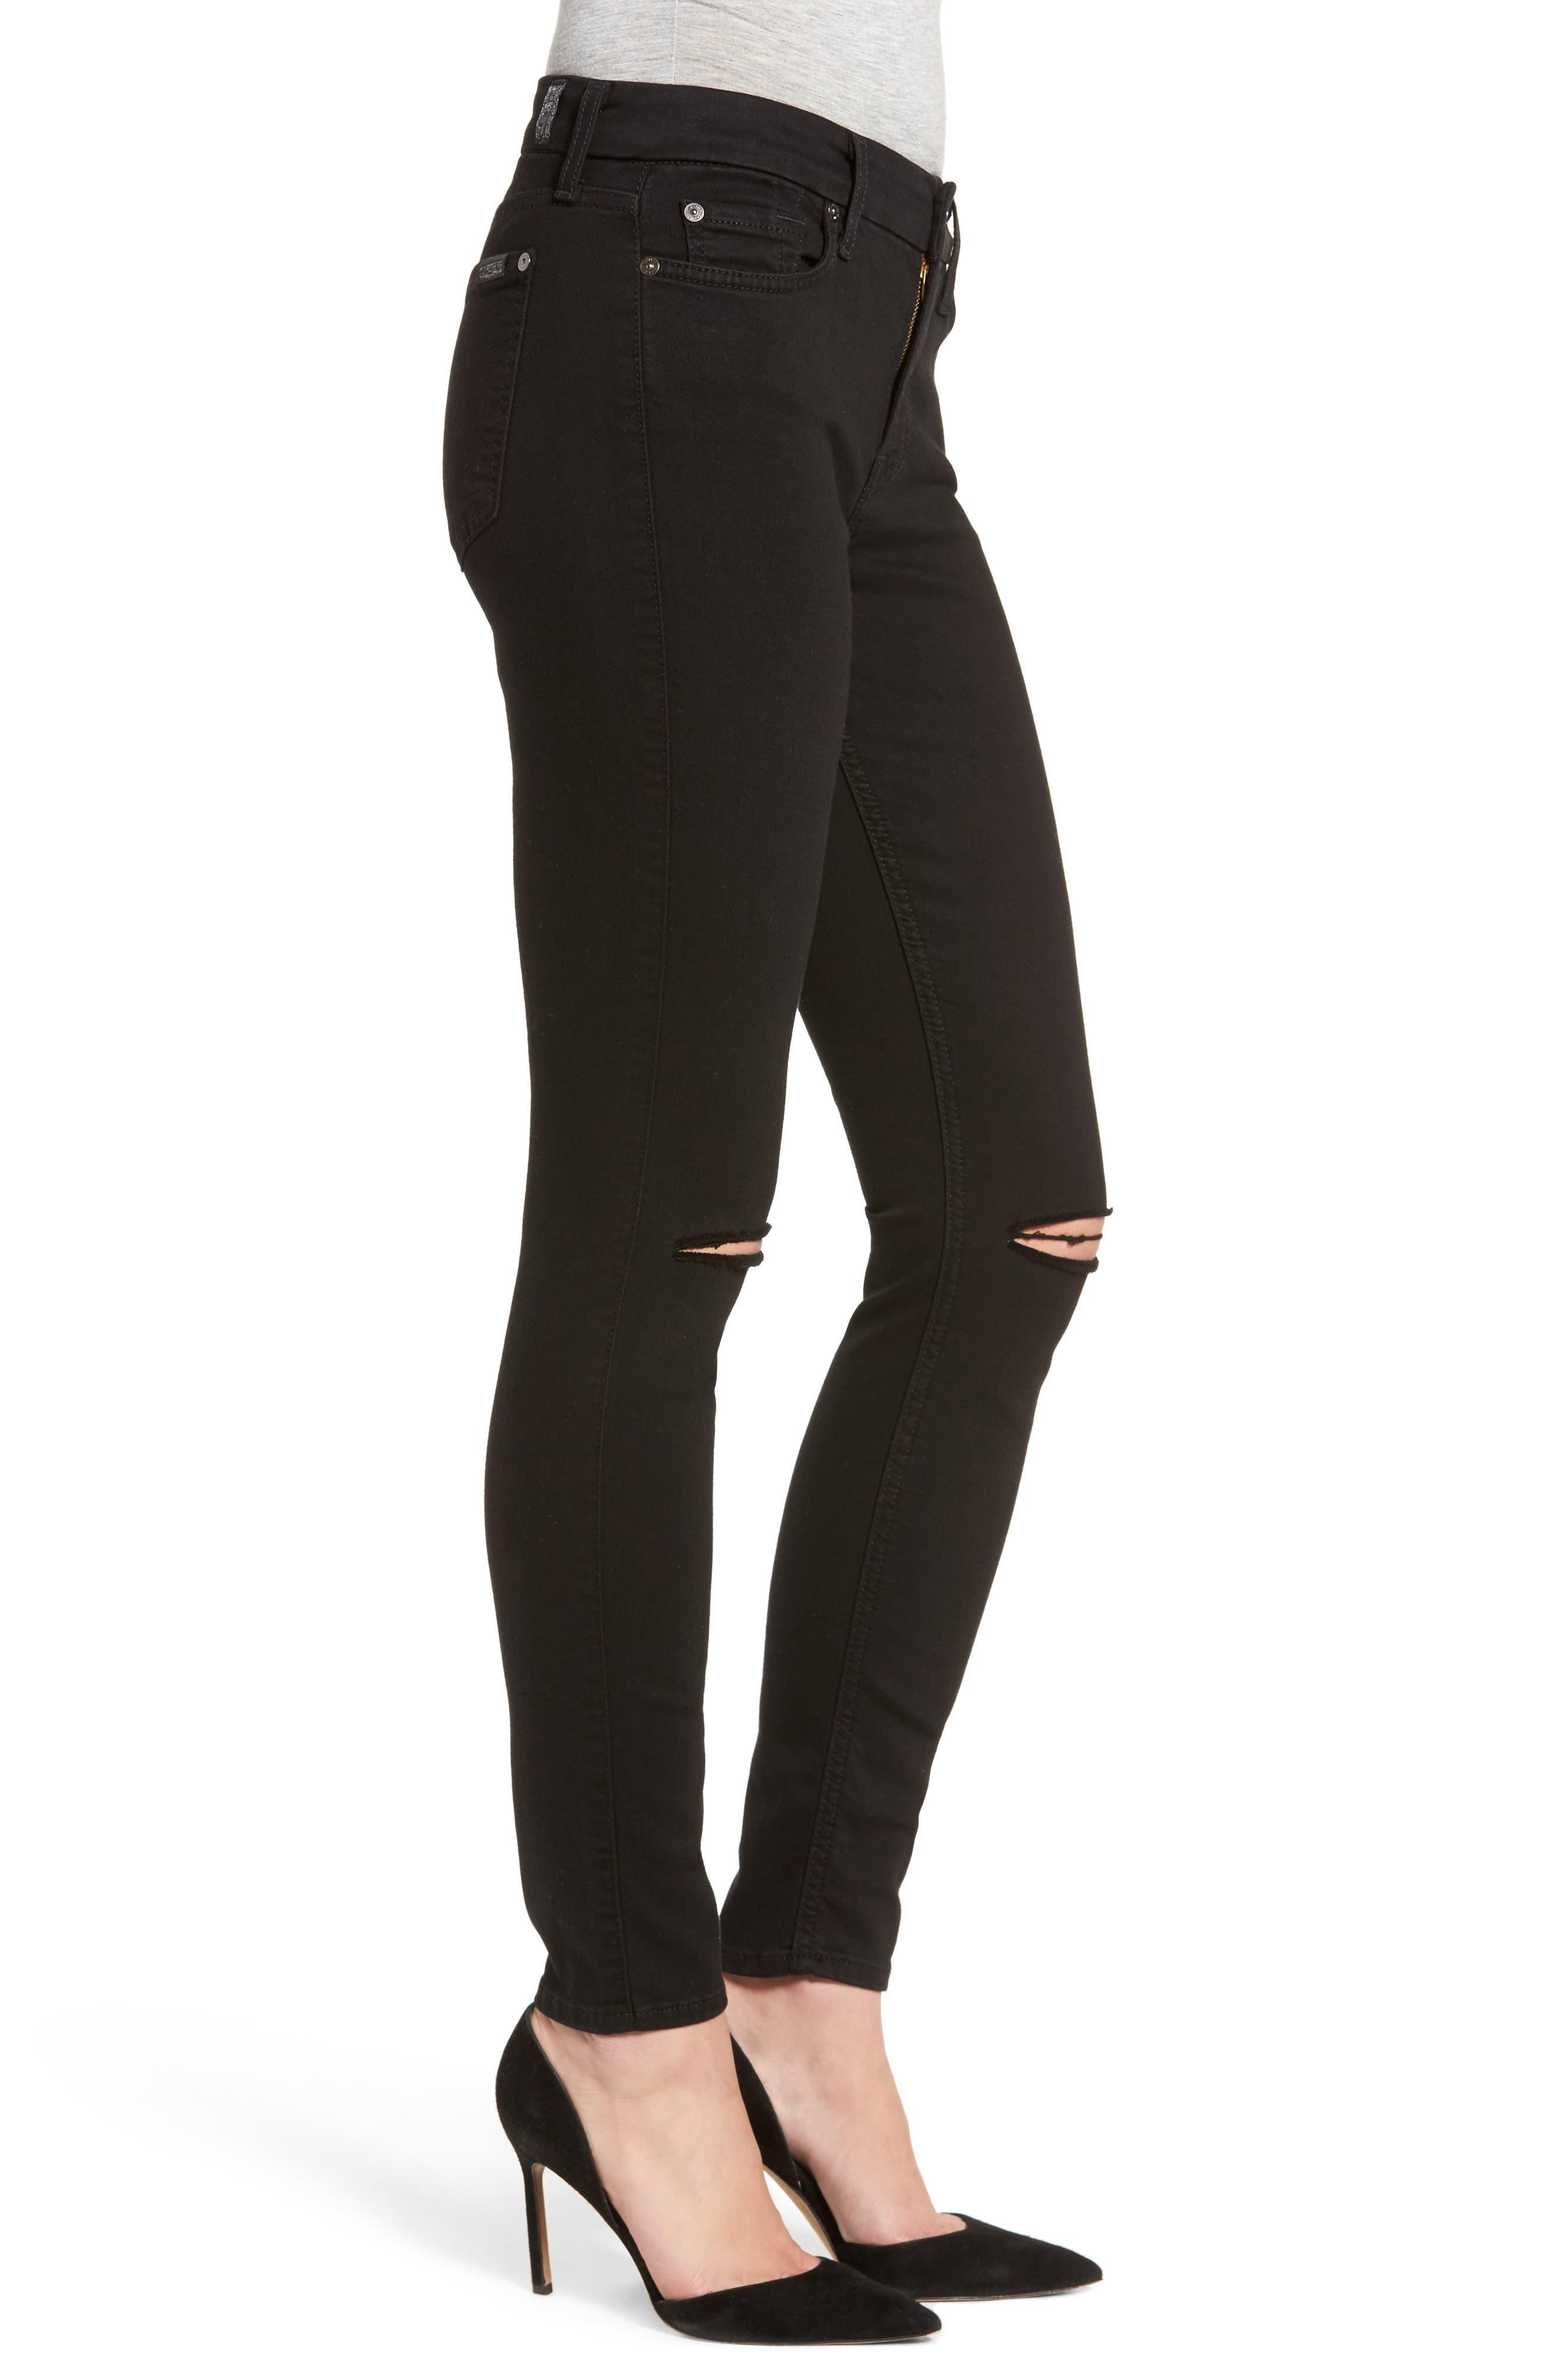 b(air) Ankle Skinny Jeans,                             Alternate thumbnail 3, color,                             BAIR BLACK 2